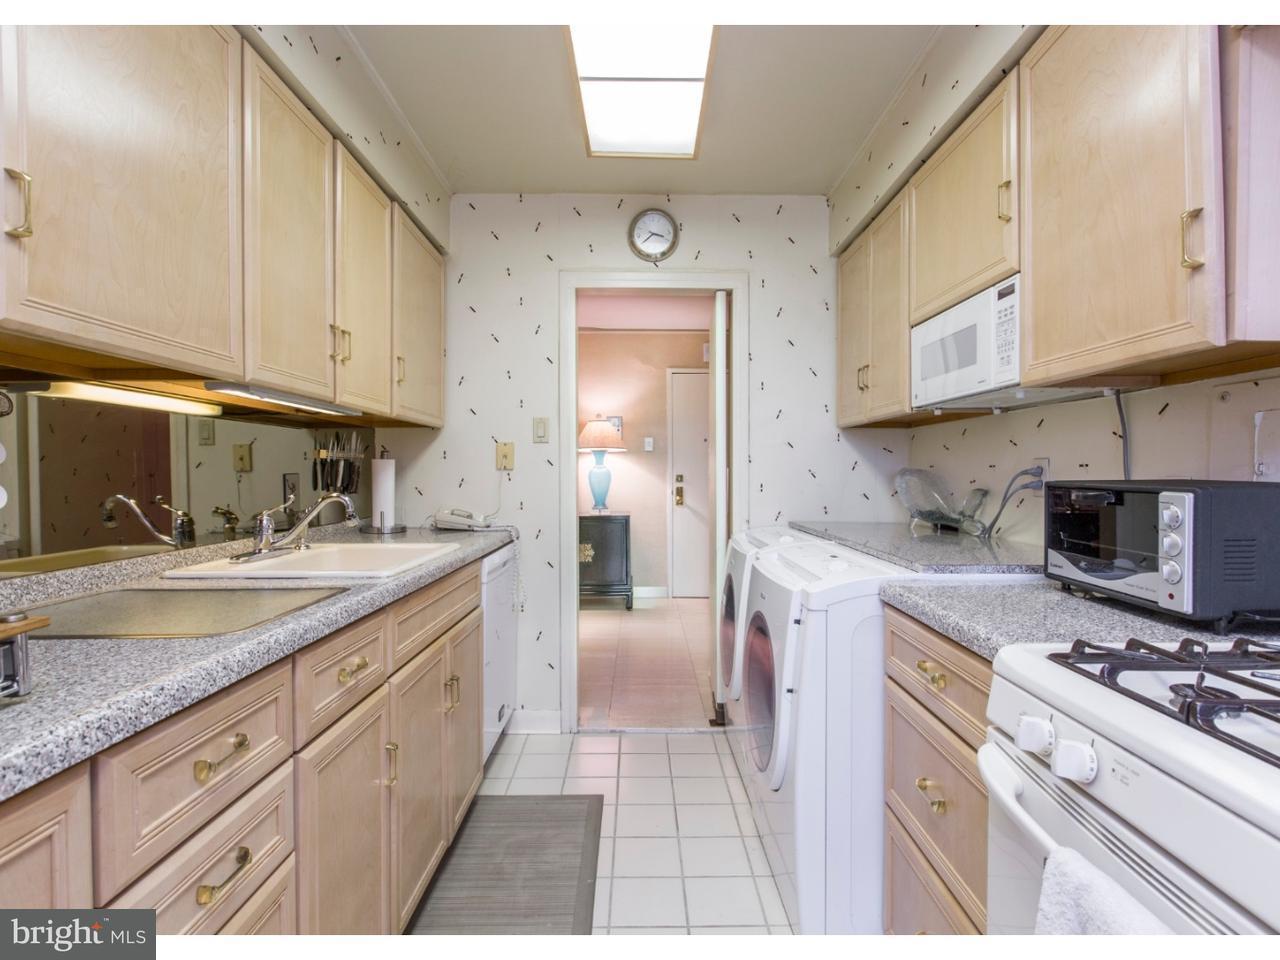 50 Belmont Avenue #410 Bala Cynwyd , PA 19004